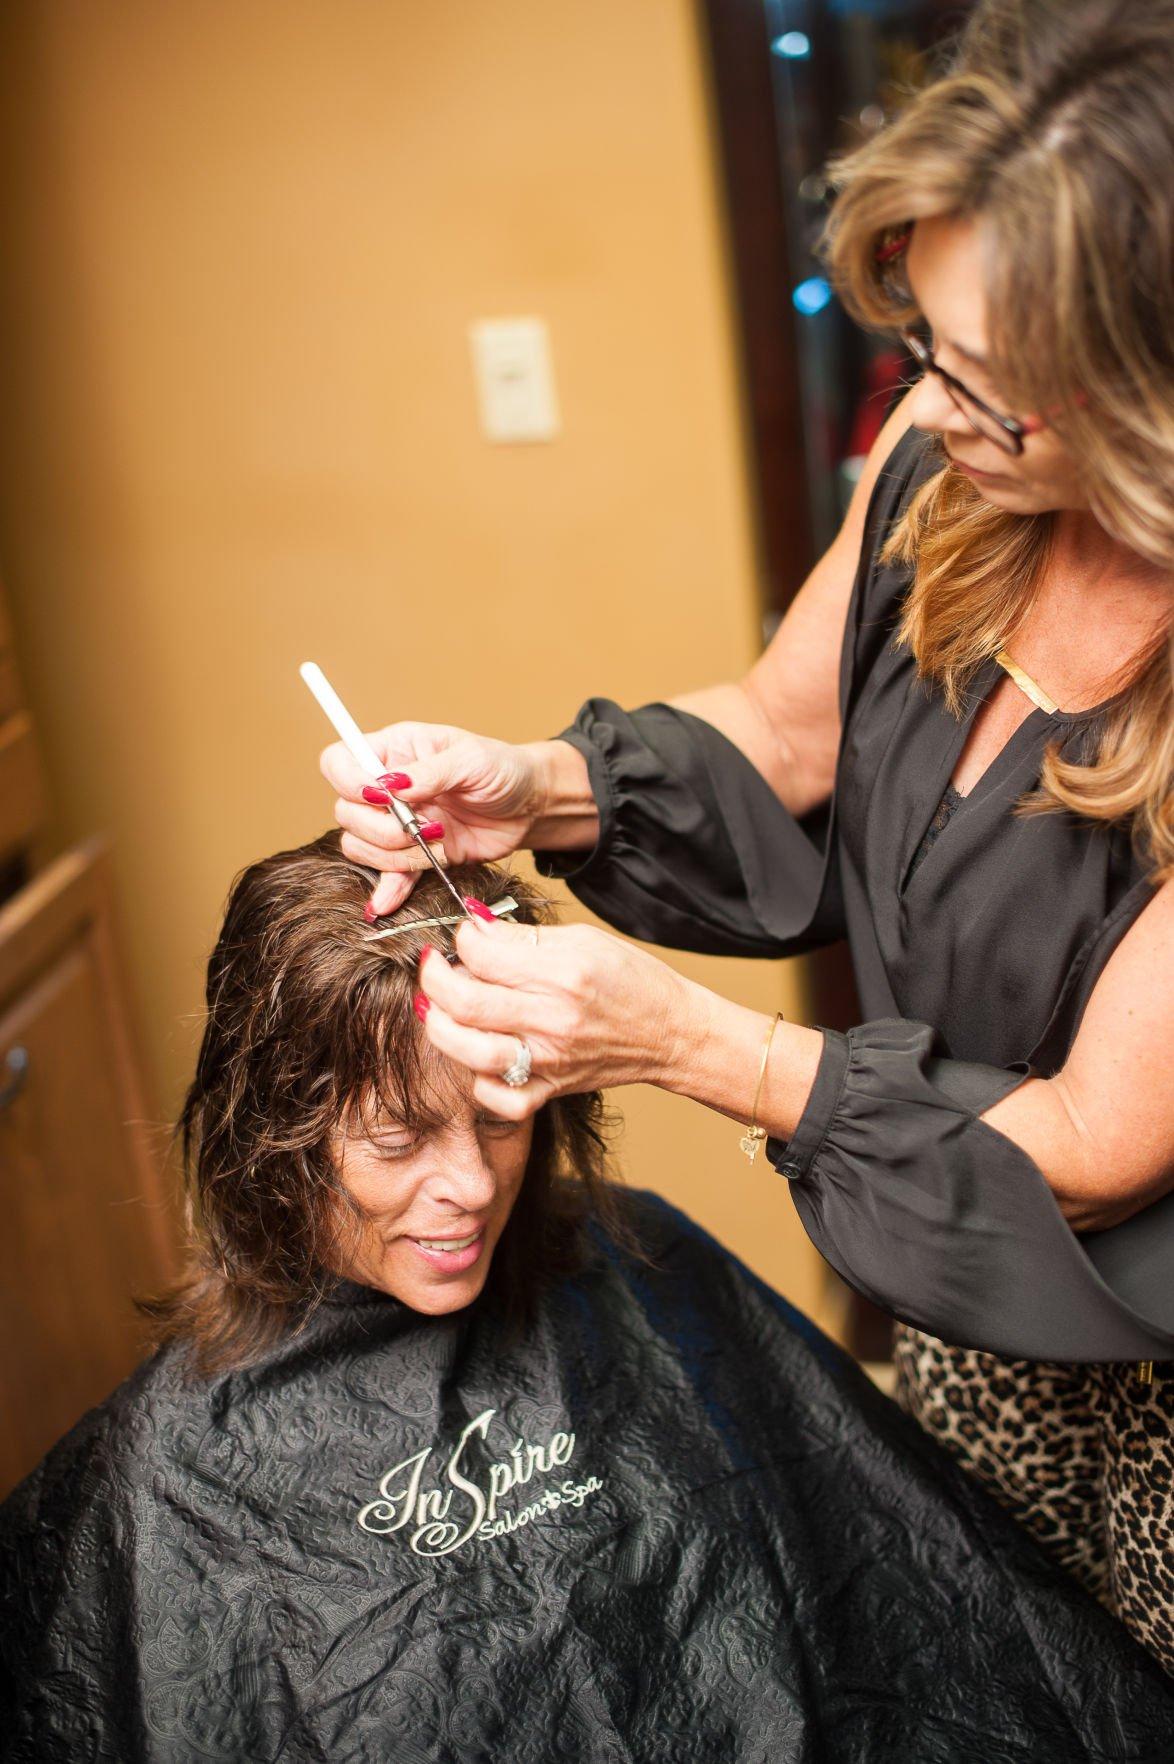 Evolve Volumizer Restoring Self Confidence Health Bakersfield